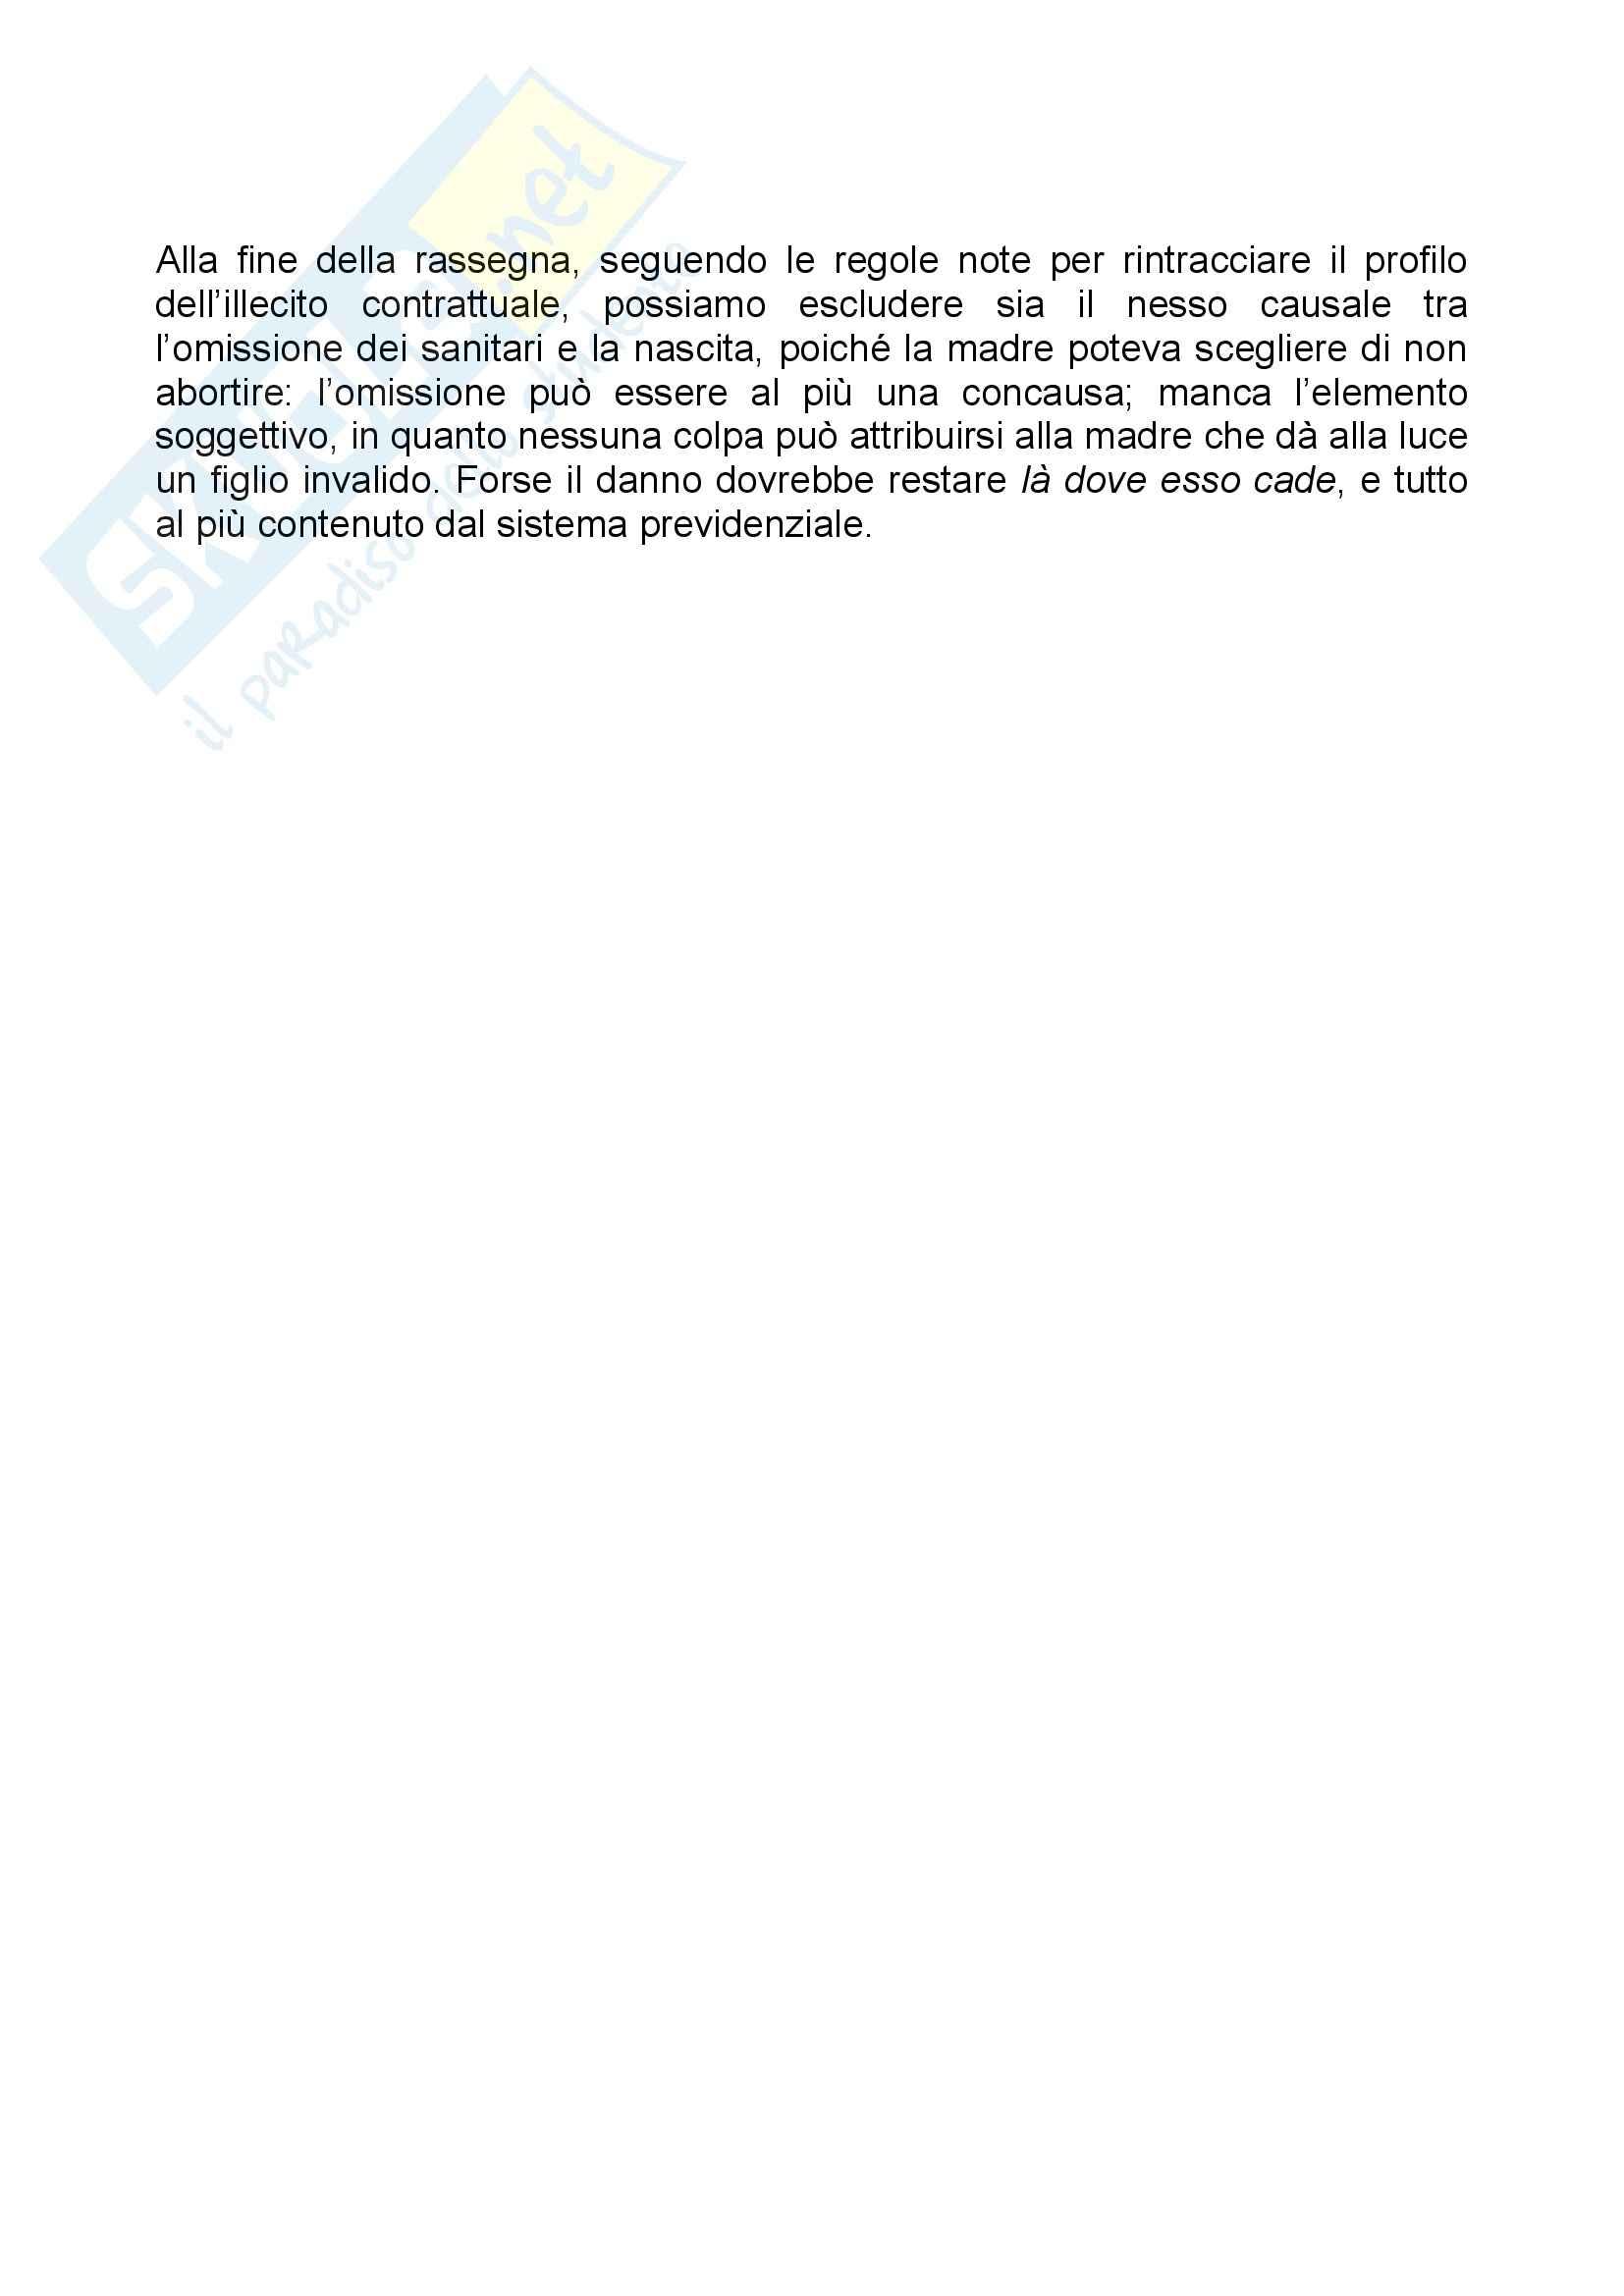 Diritto Civile - Sentenze - Riassunto esame, prof. Ricca Pag. 6